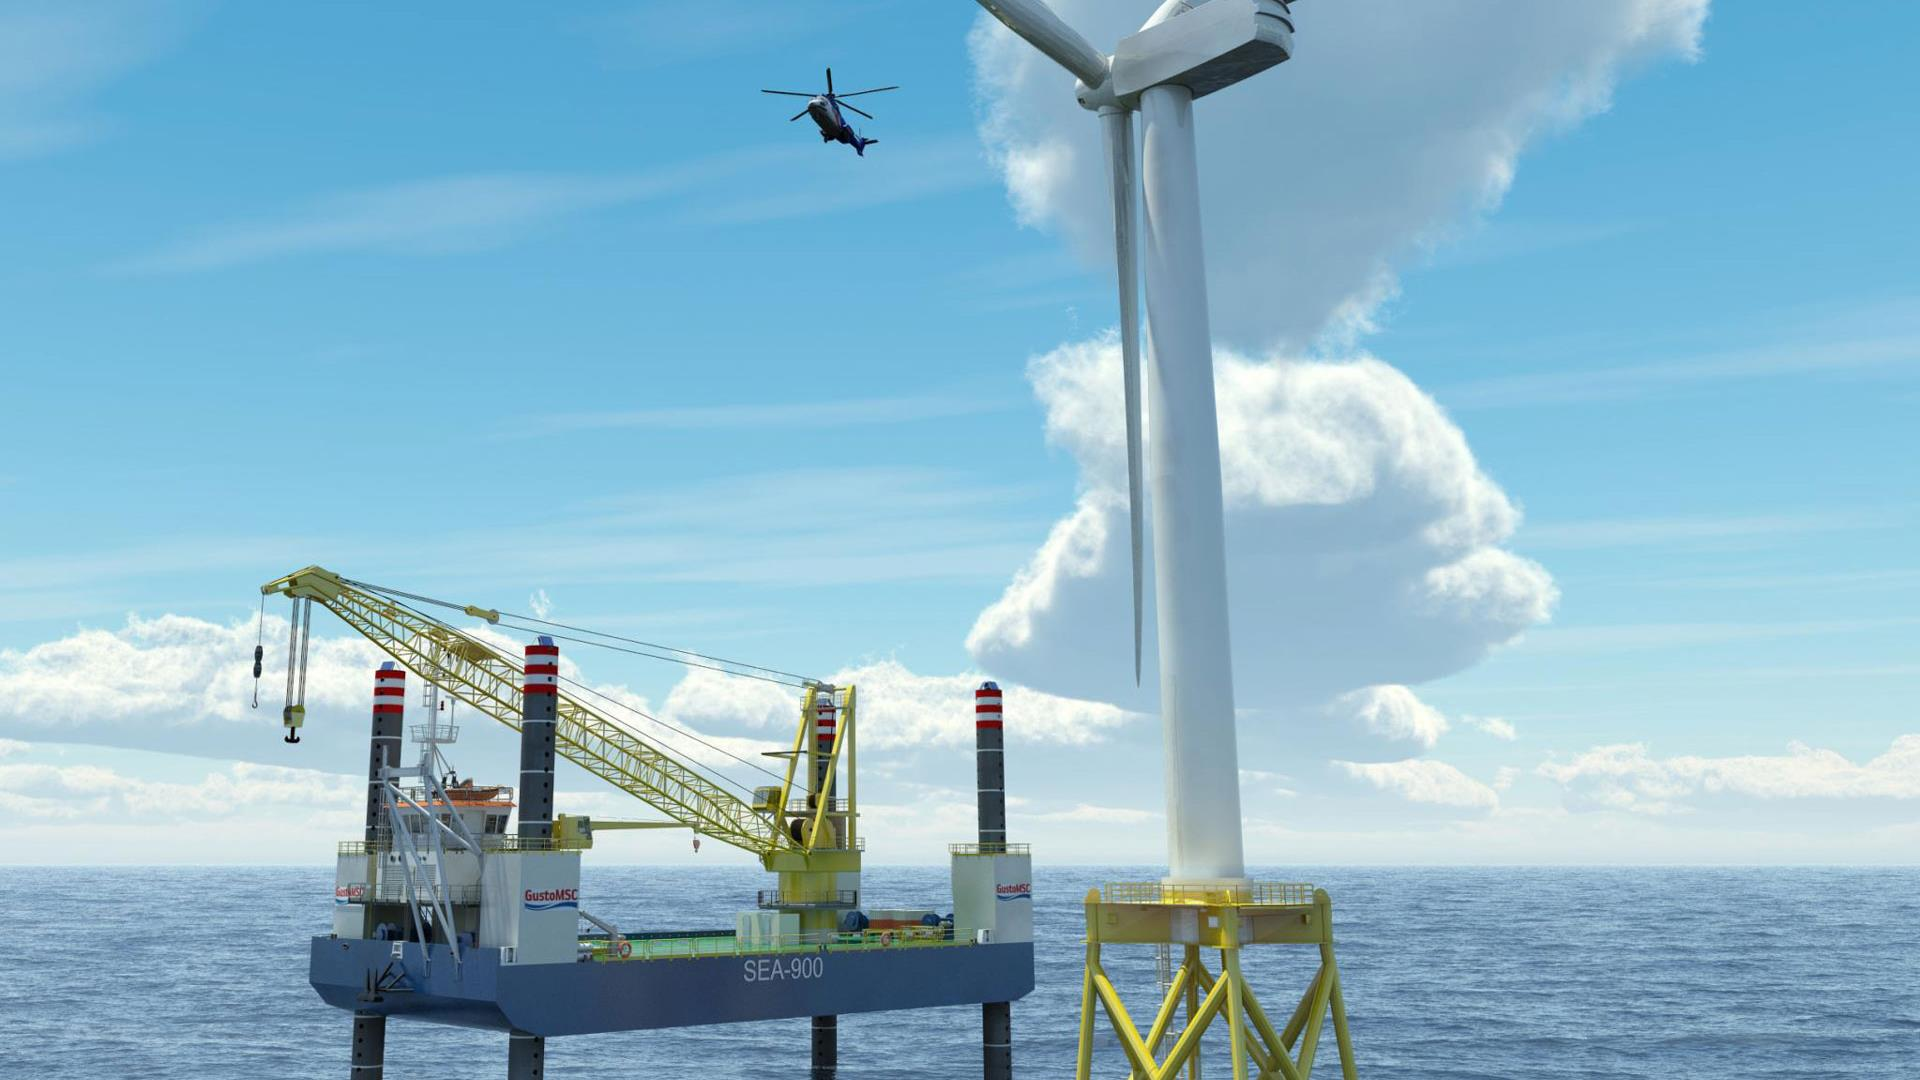 SEA-900 Offshore Windmill installation